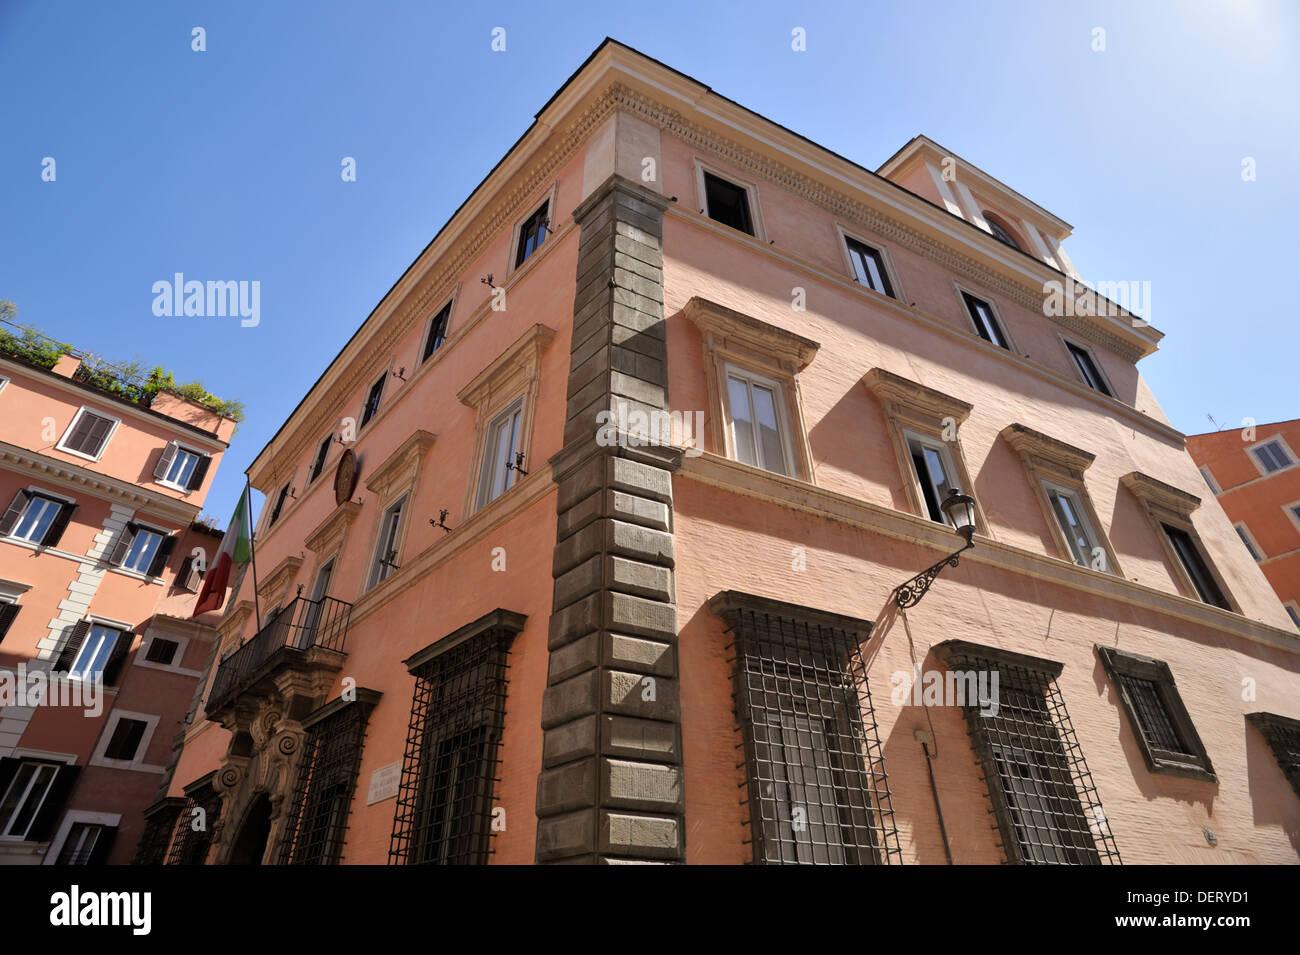 italy, rome, palazzo carpegna, accademia nazionale di san luca, national academy of fine arts - Stock Image